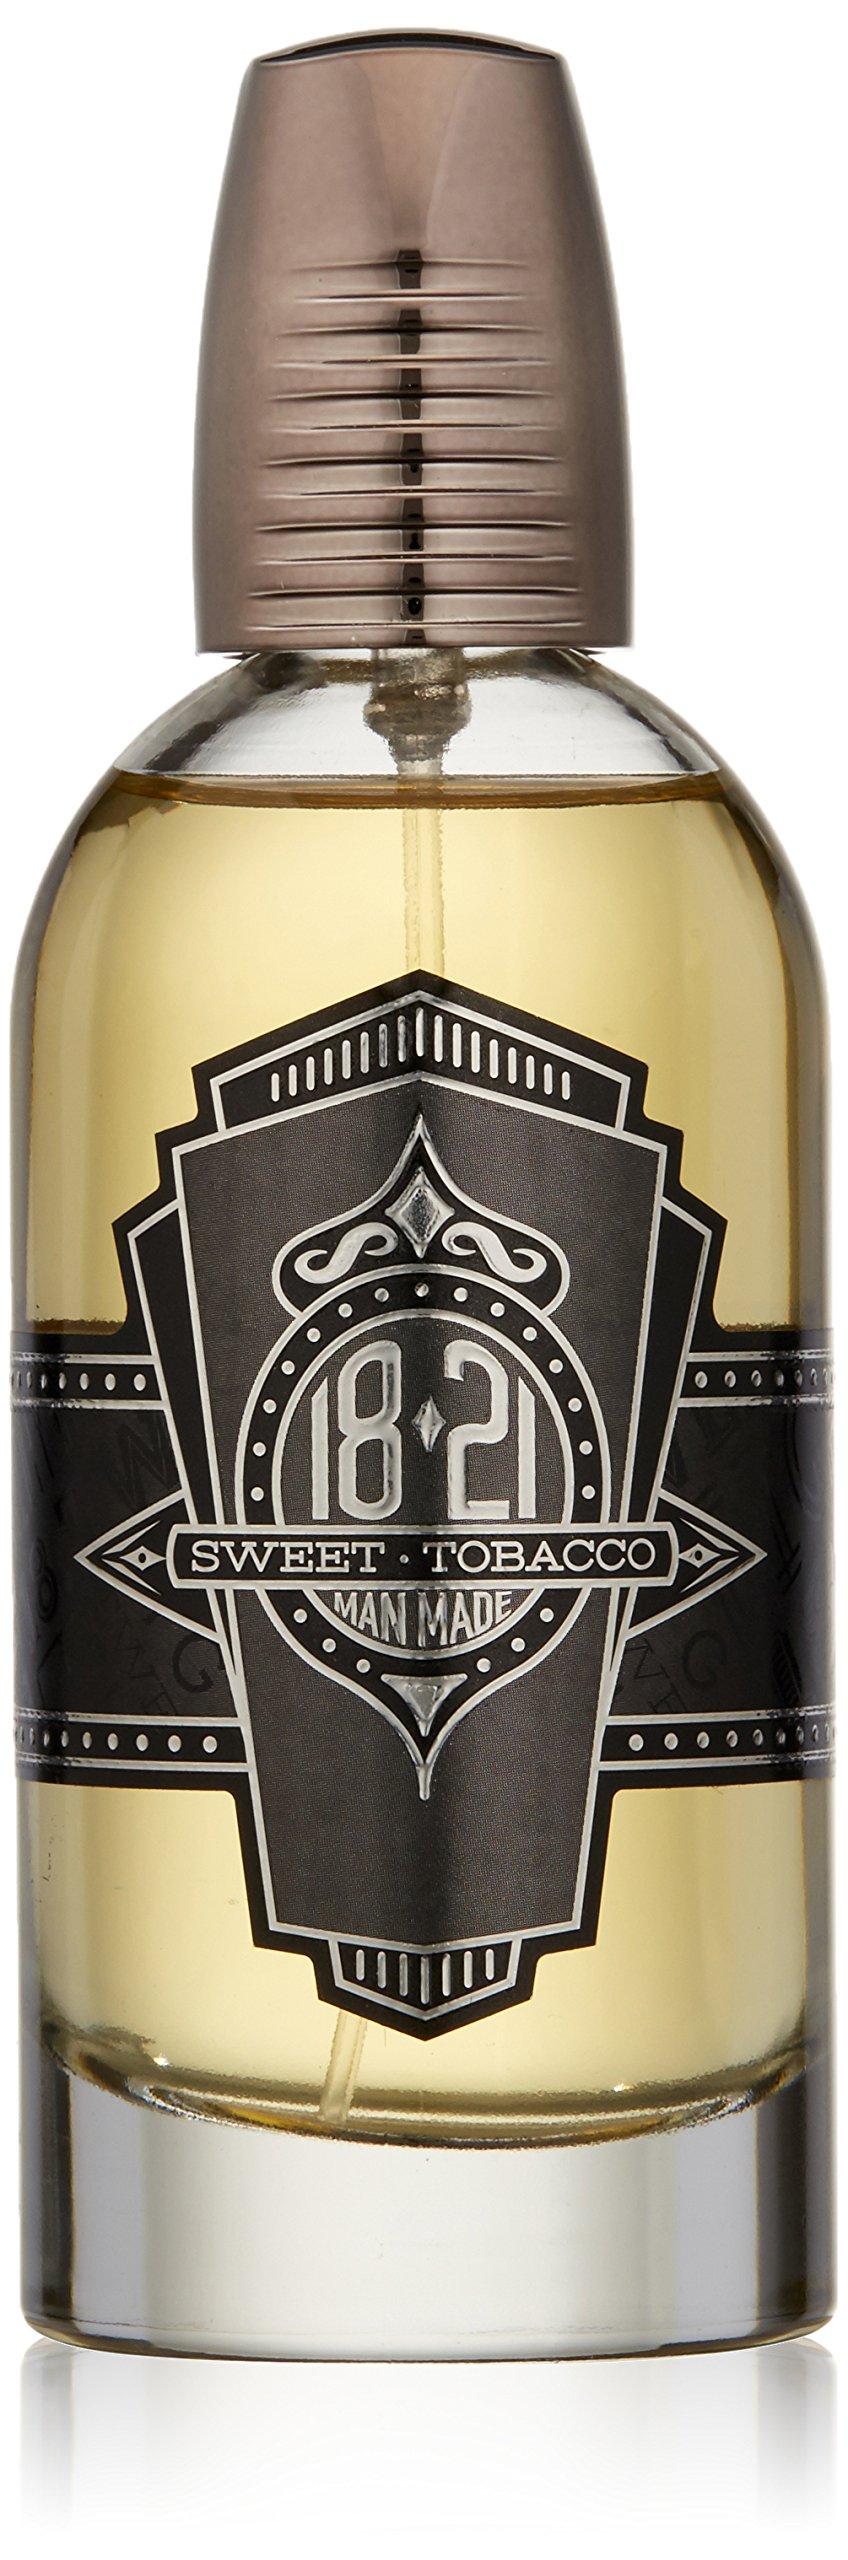 18.21 Man Made Men's Cologne, Tobacco Vanilla Fragrance, 3.4 fl. oz - Long-Lasting Eau de Parfum for Men, Sweet Scent with Woodsy Undertones - Eau de Toilette with Masculine Aromatics by 18.21 Man Made